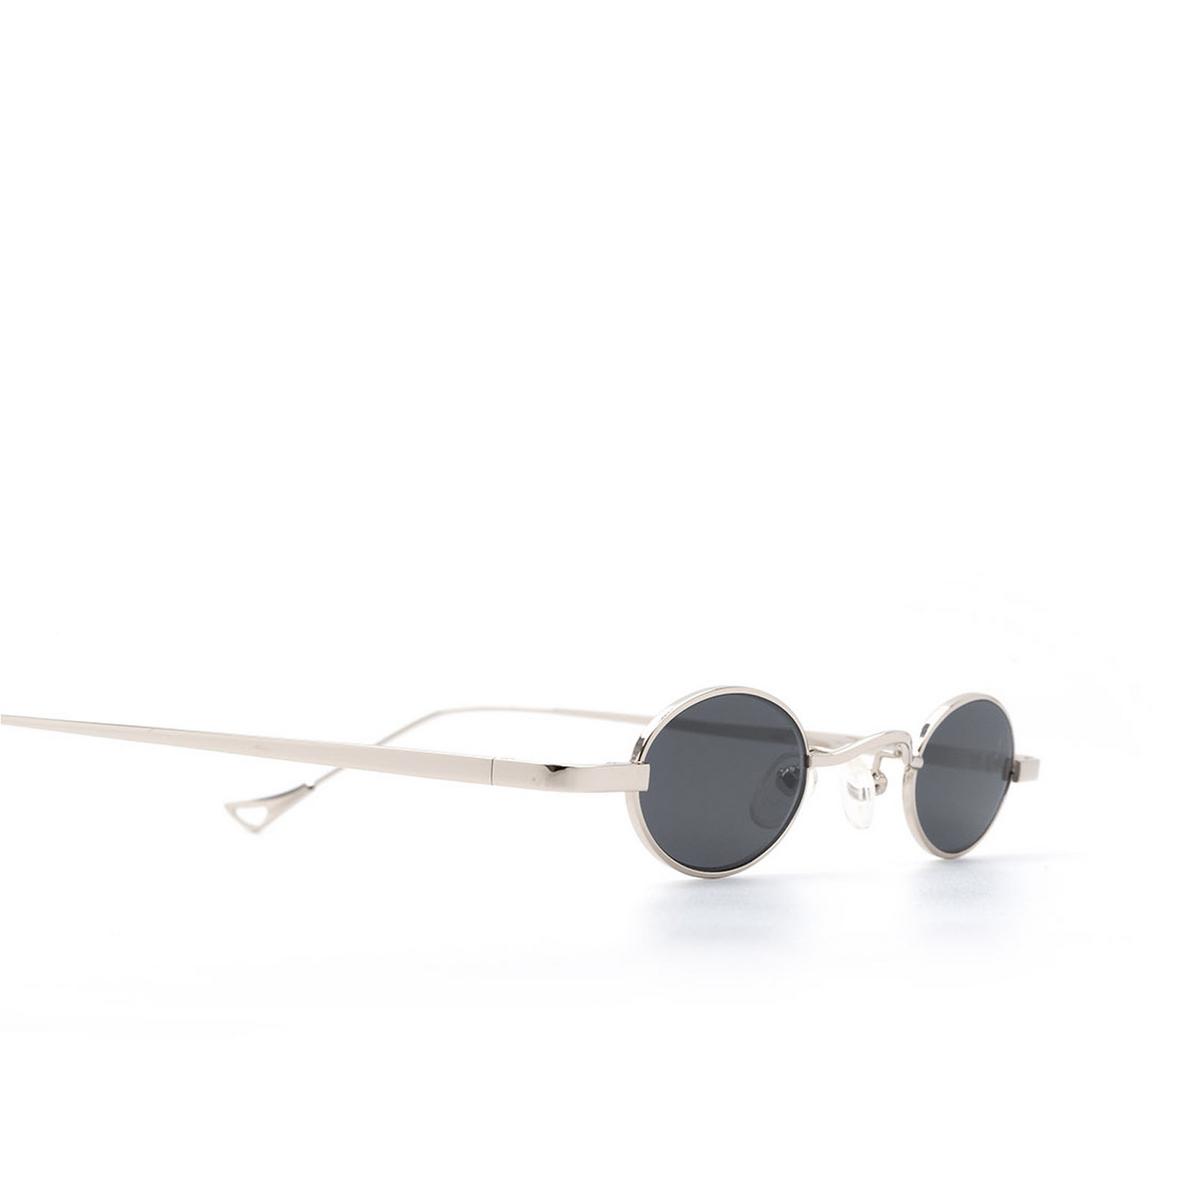 eyepetizer-duke-c-1-7 (2)